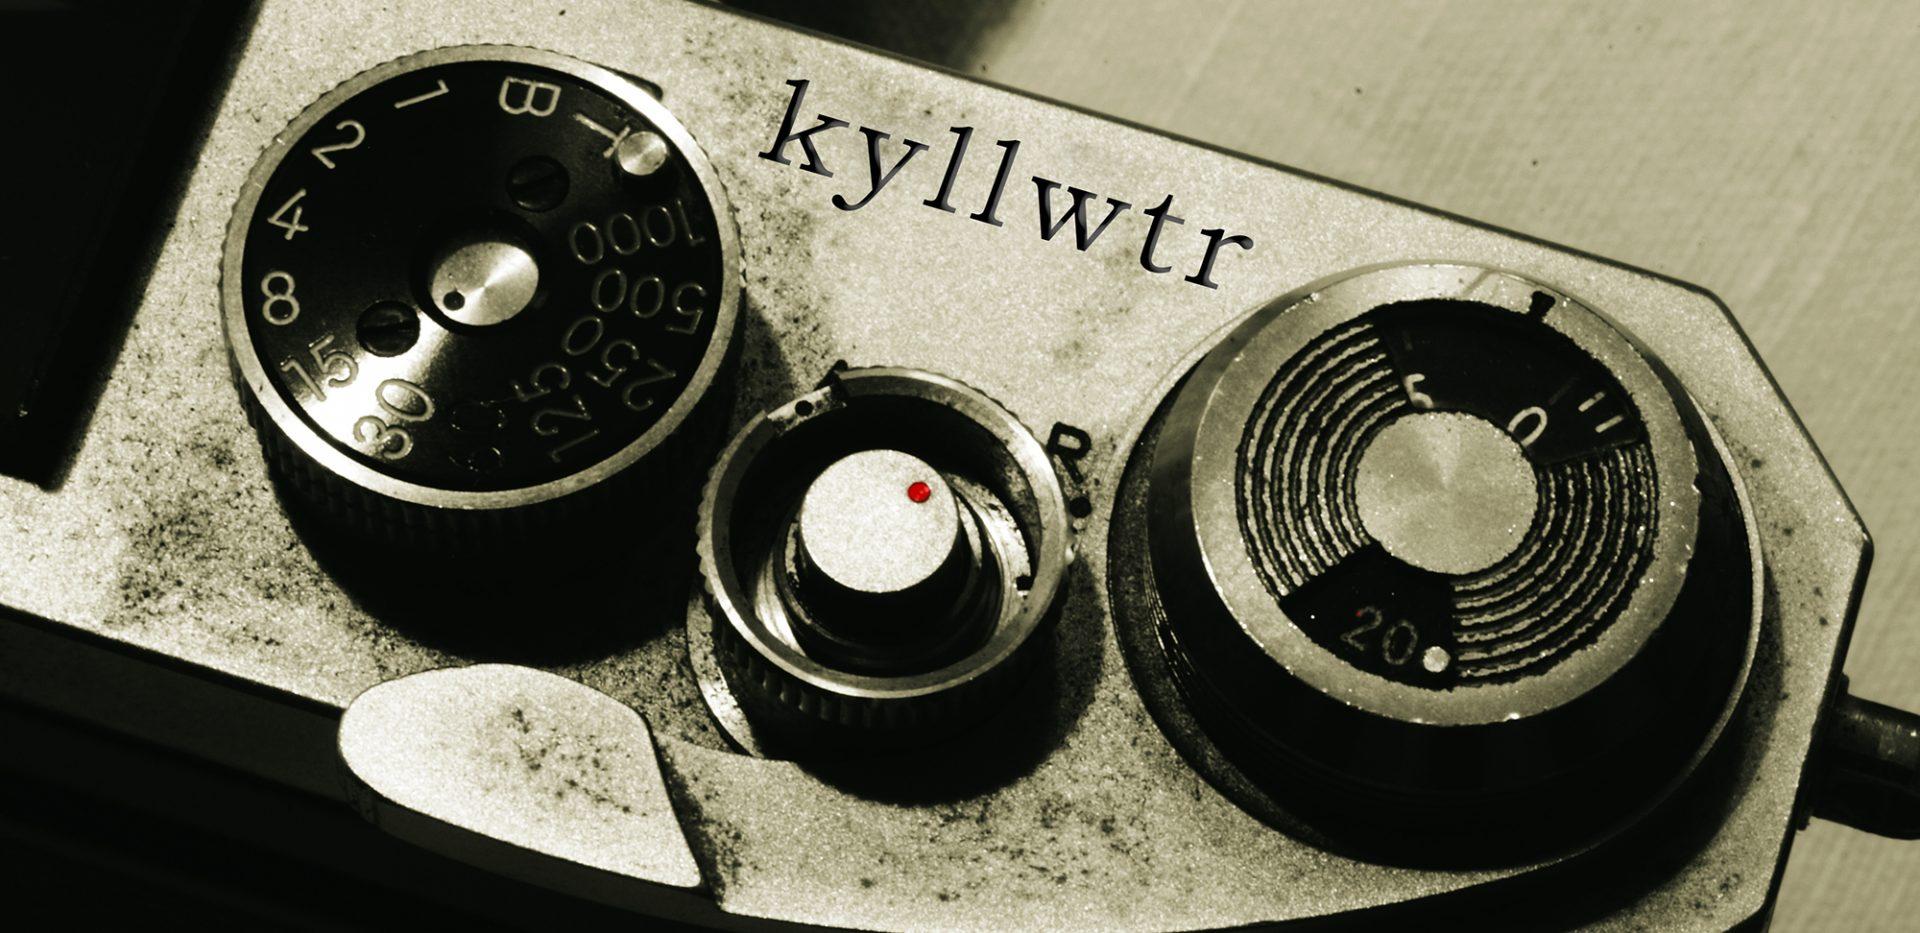 Kyllwtr's blog